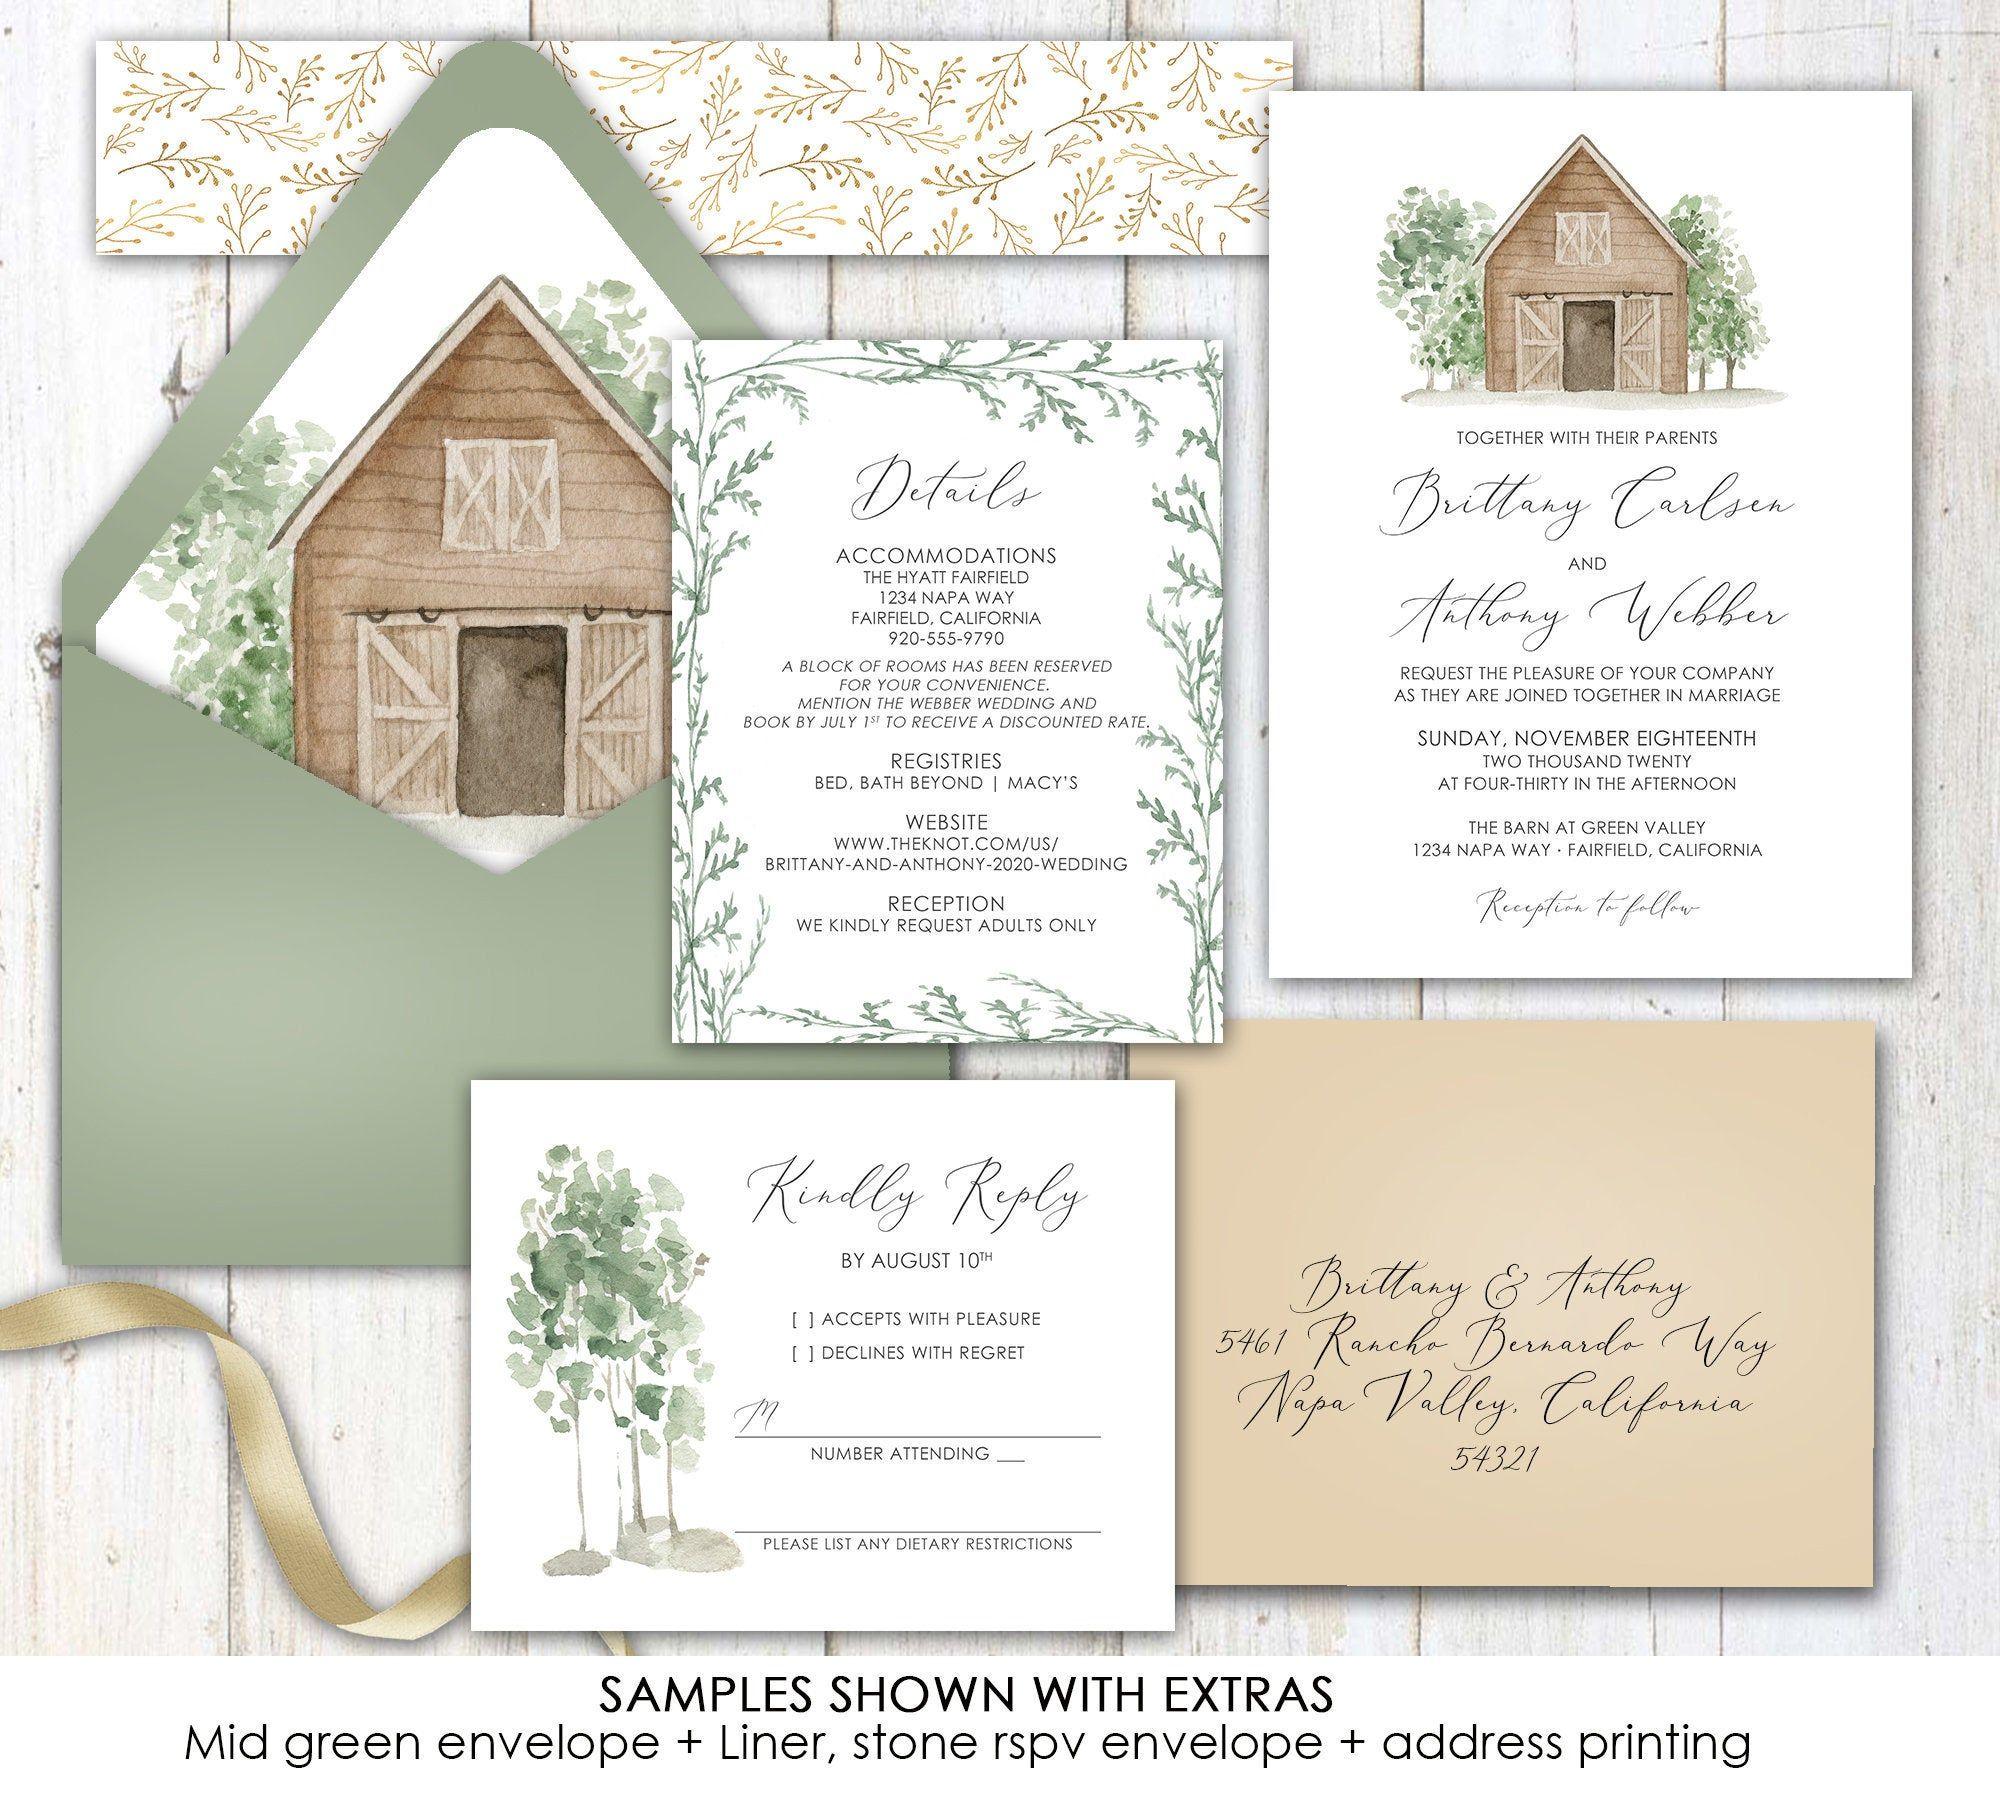 Barn Wedding Invitation Barn Rustic Simple Greenery Etsy Barn Wedding Invitations Wedding Invitations Barn Wedding